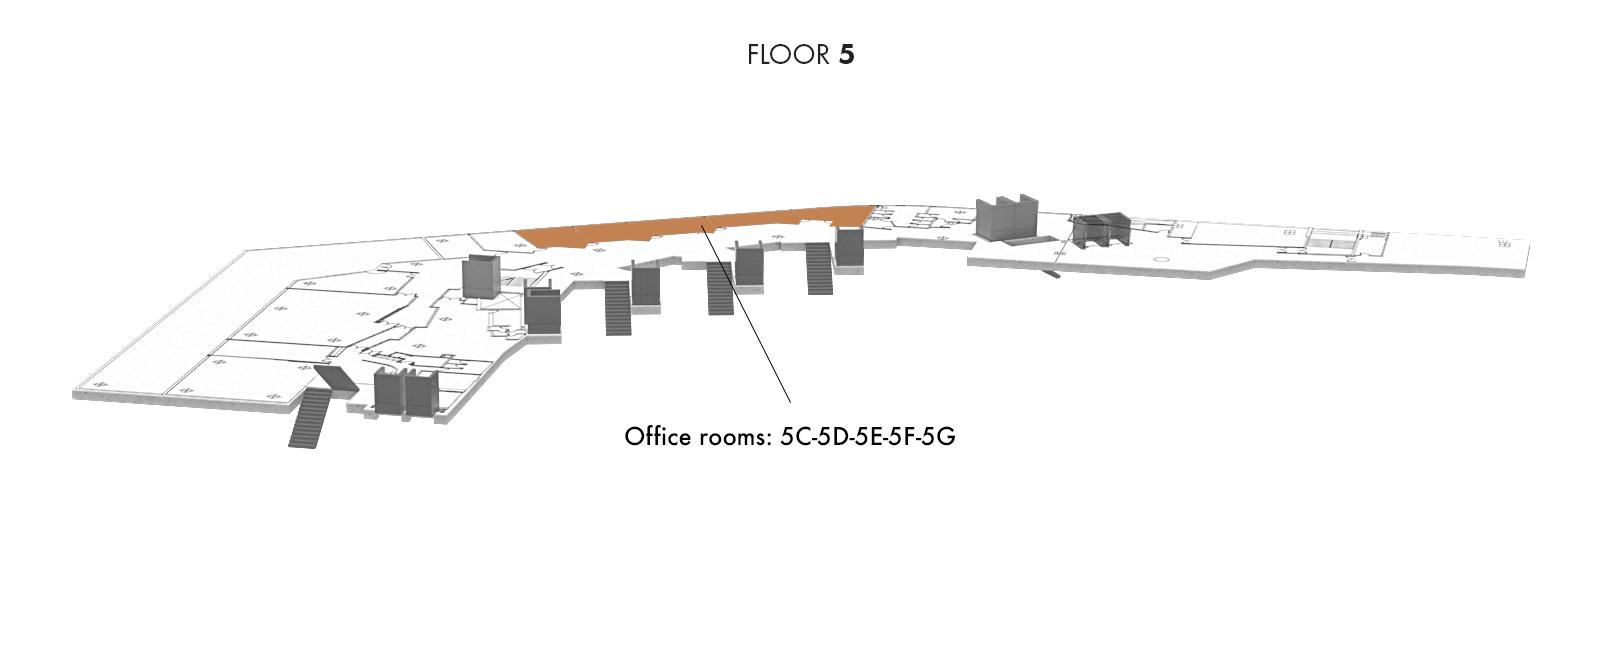 Office rooms: 5C-5D-5E-5F-5G, Floor 5 | Palacio Euskalduna Jauregia